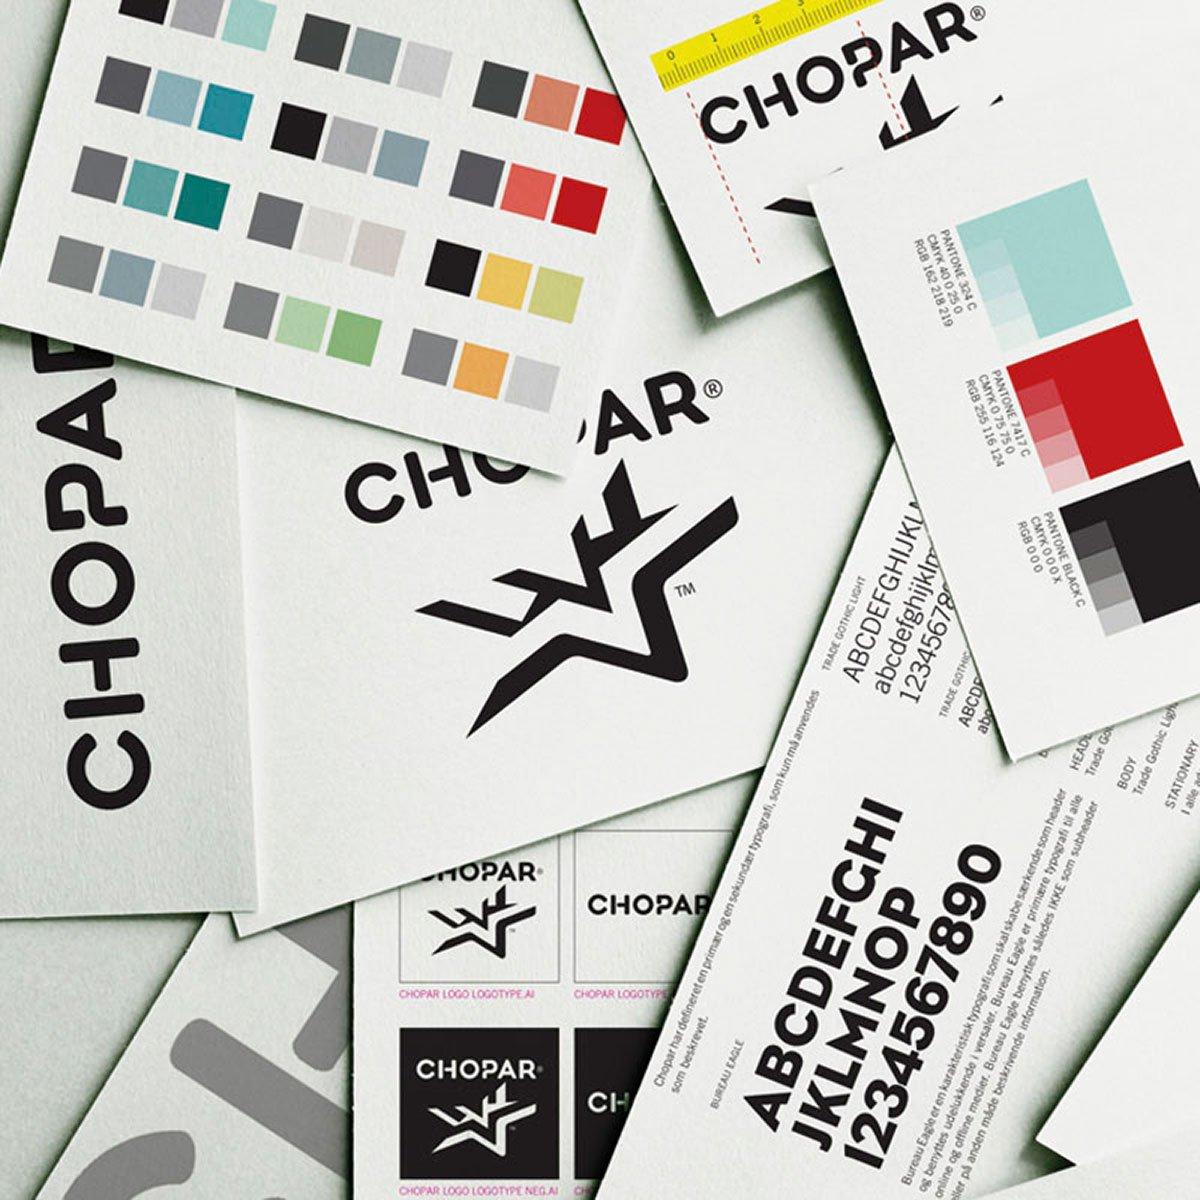 FXA-Brand-Identiy-Chopar